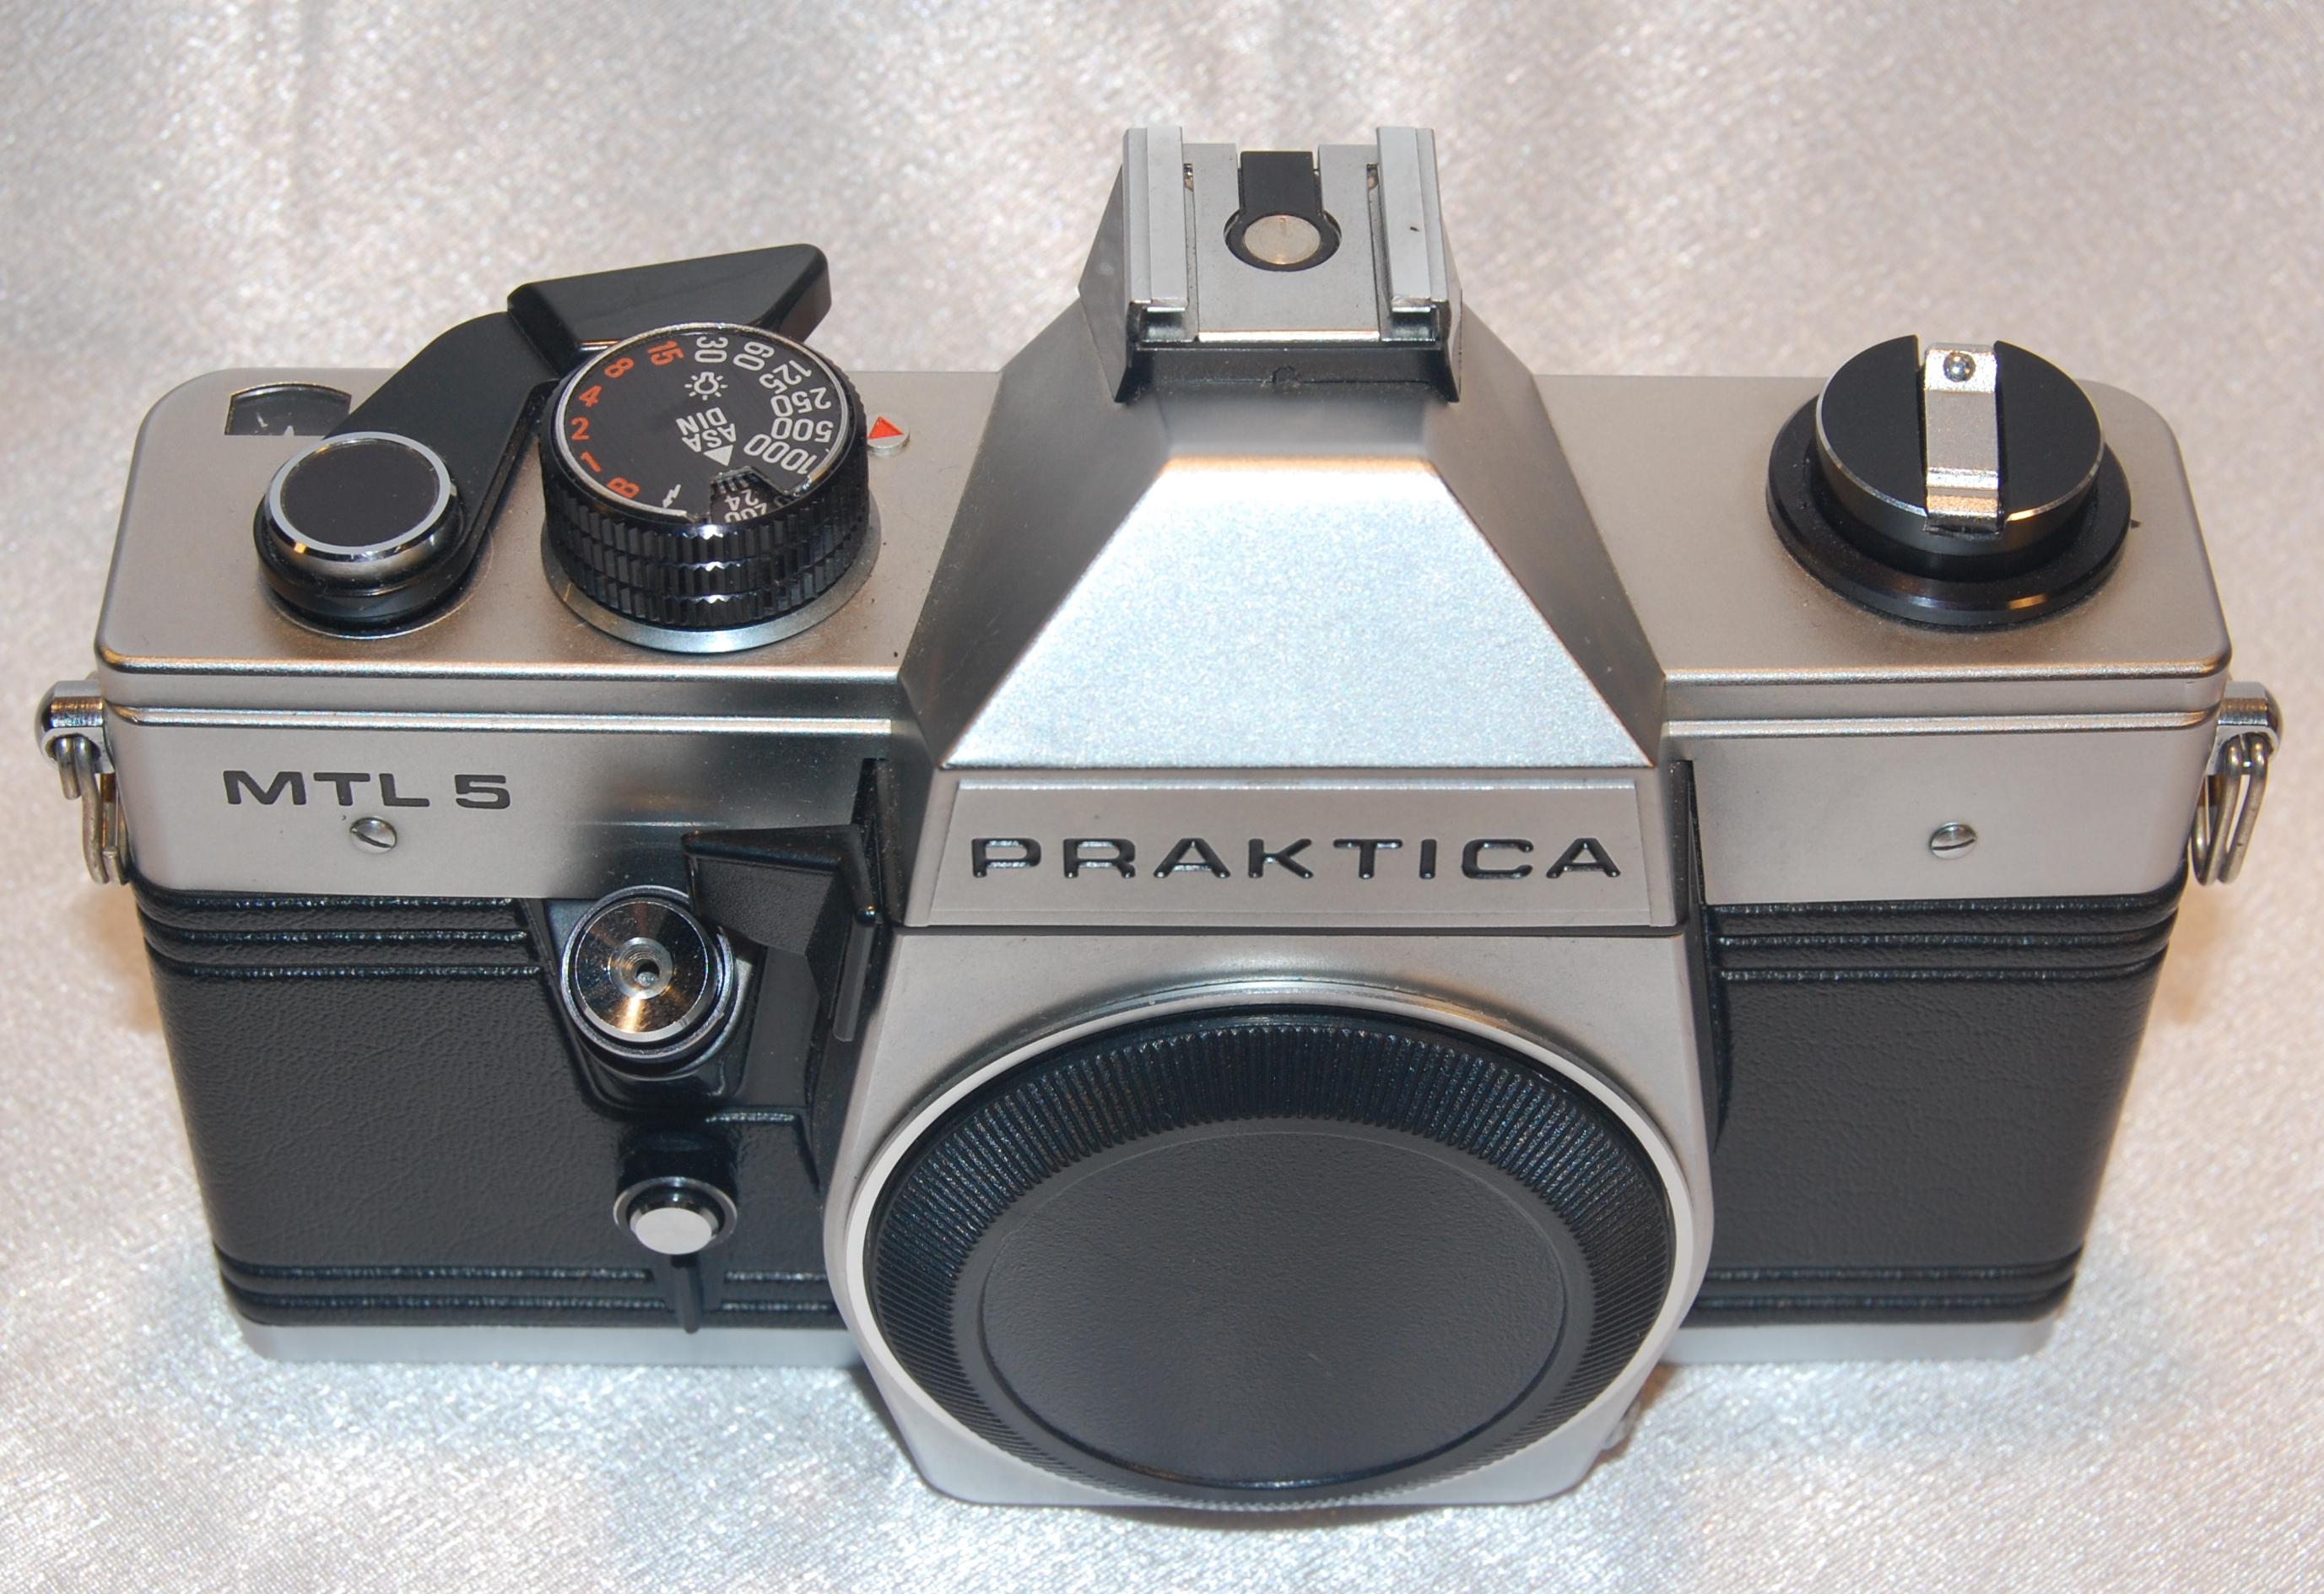 File:tag praktica mtl5 01.jpg wikimedia commons